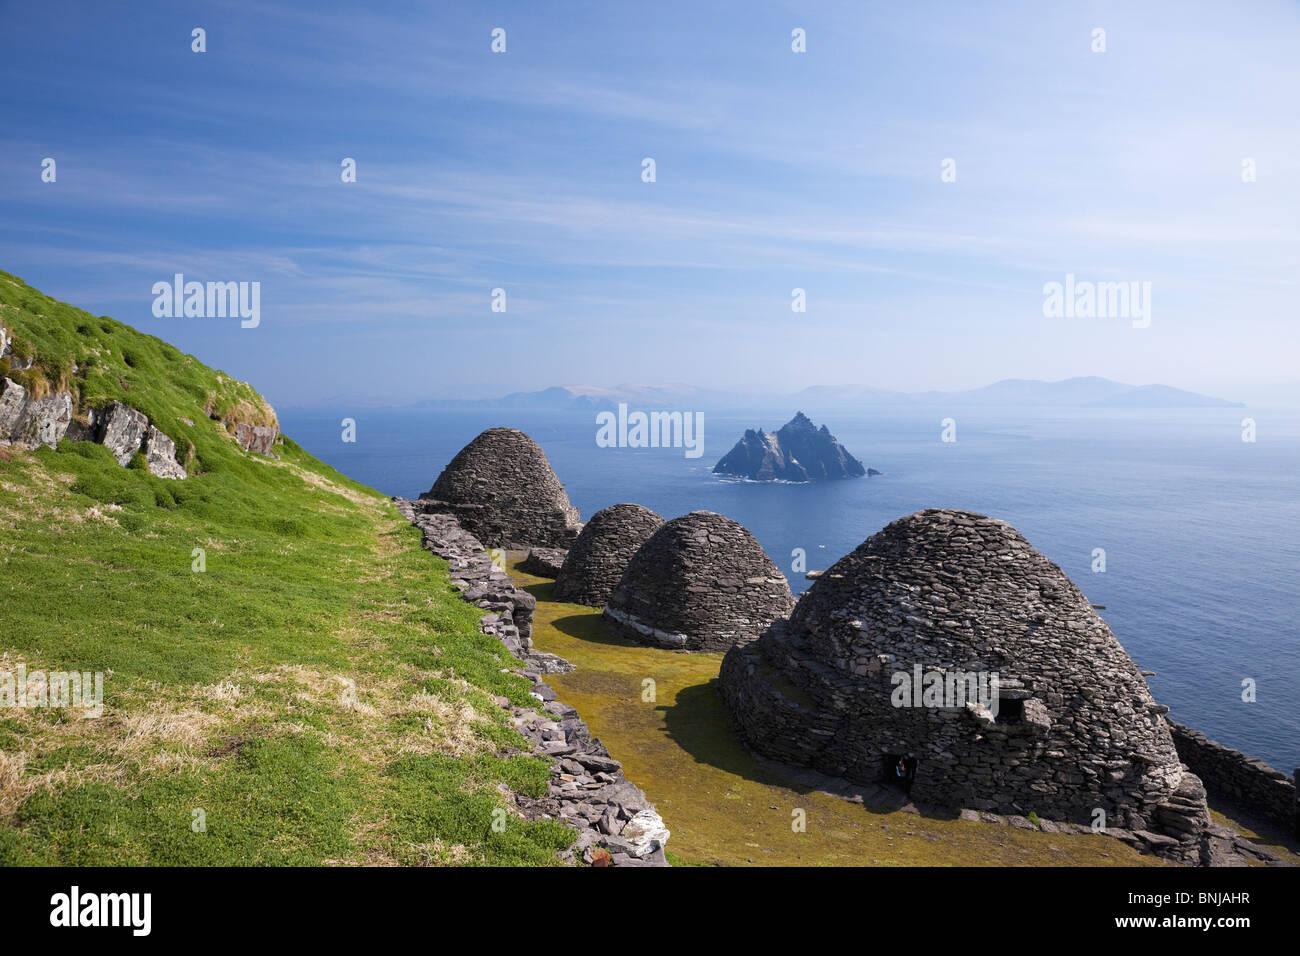 beehive-stone-huts-celtic-monastic-monas